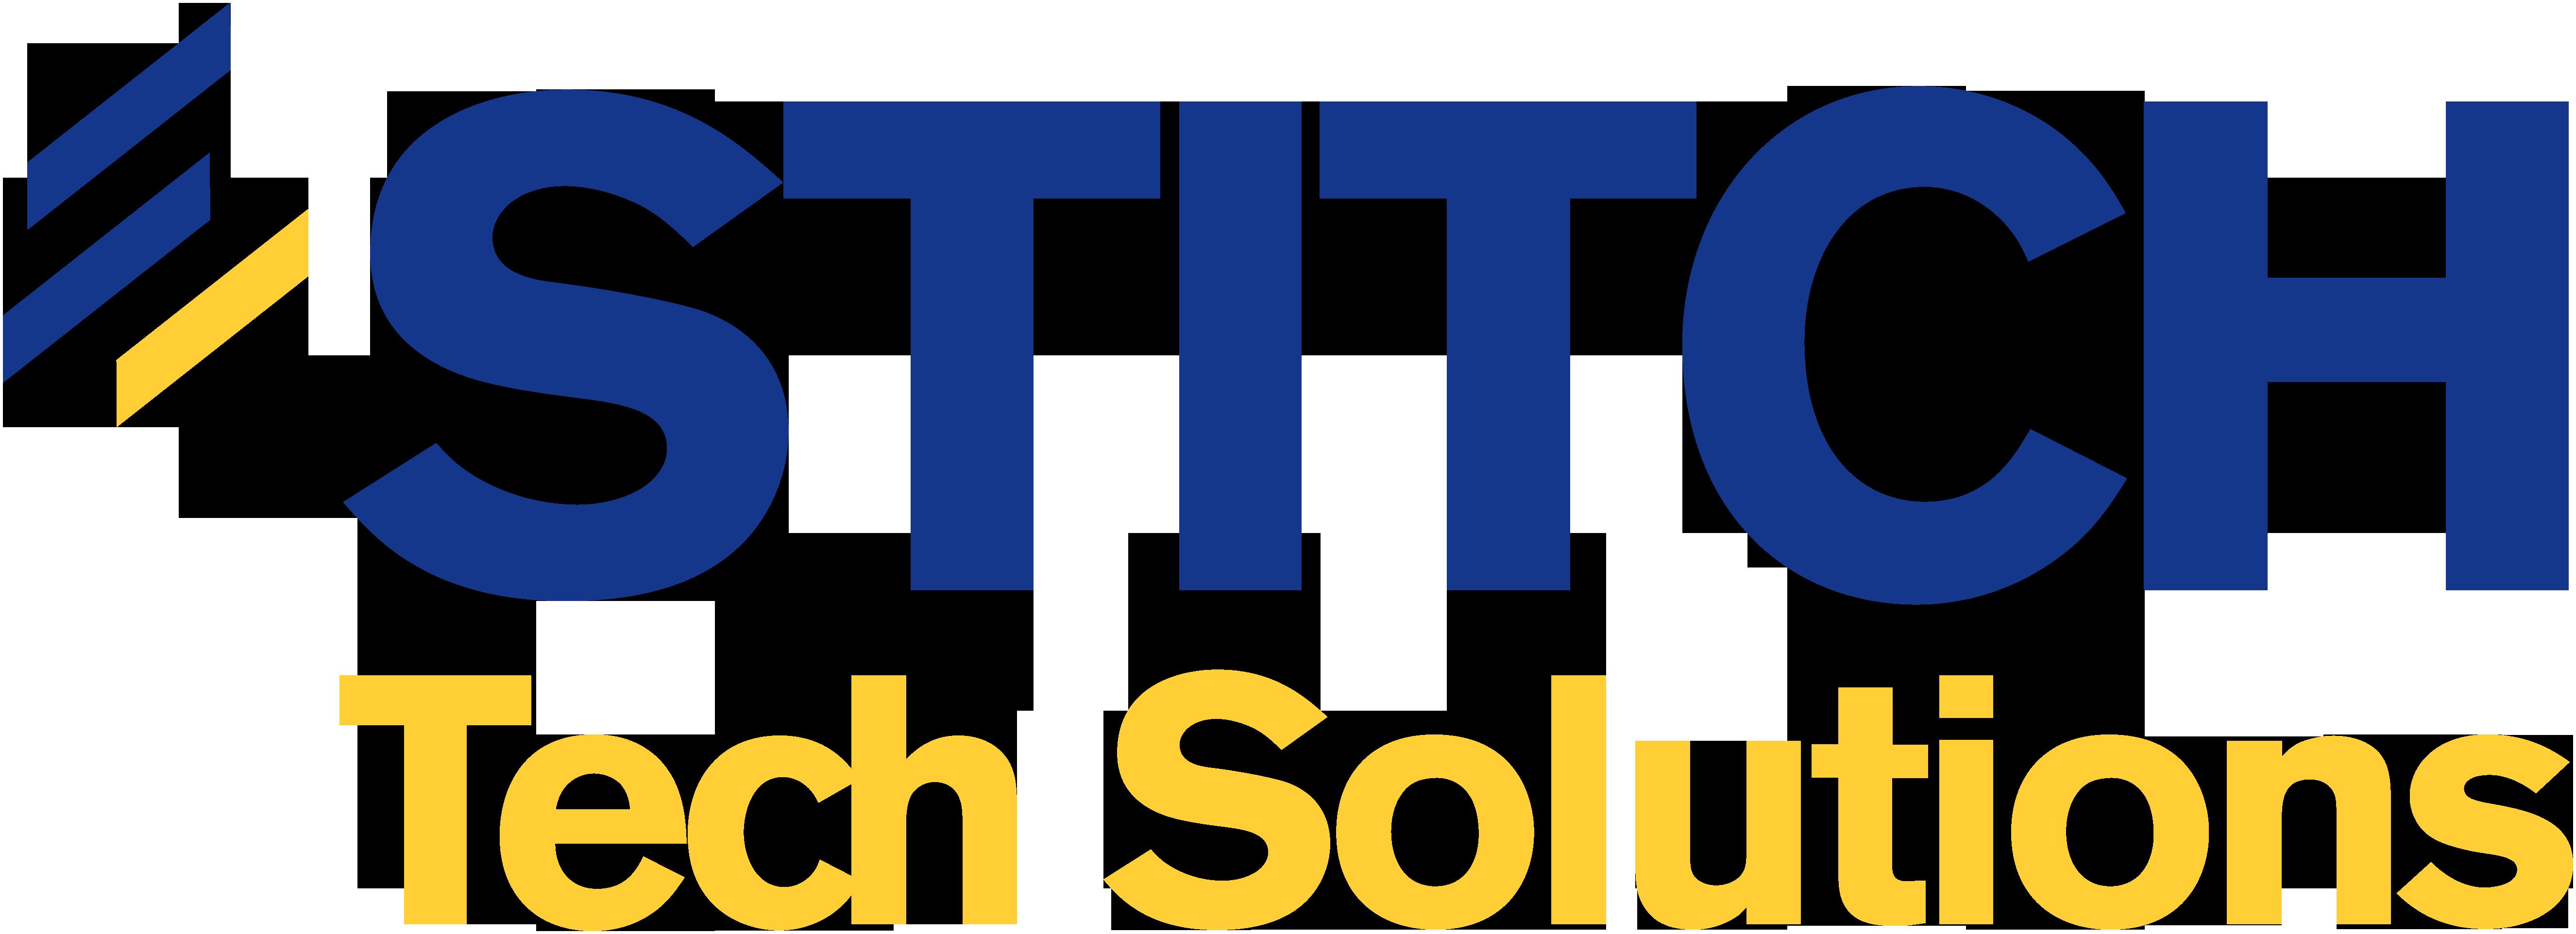 Stitch Tech Solutions